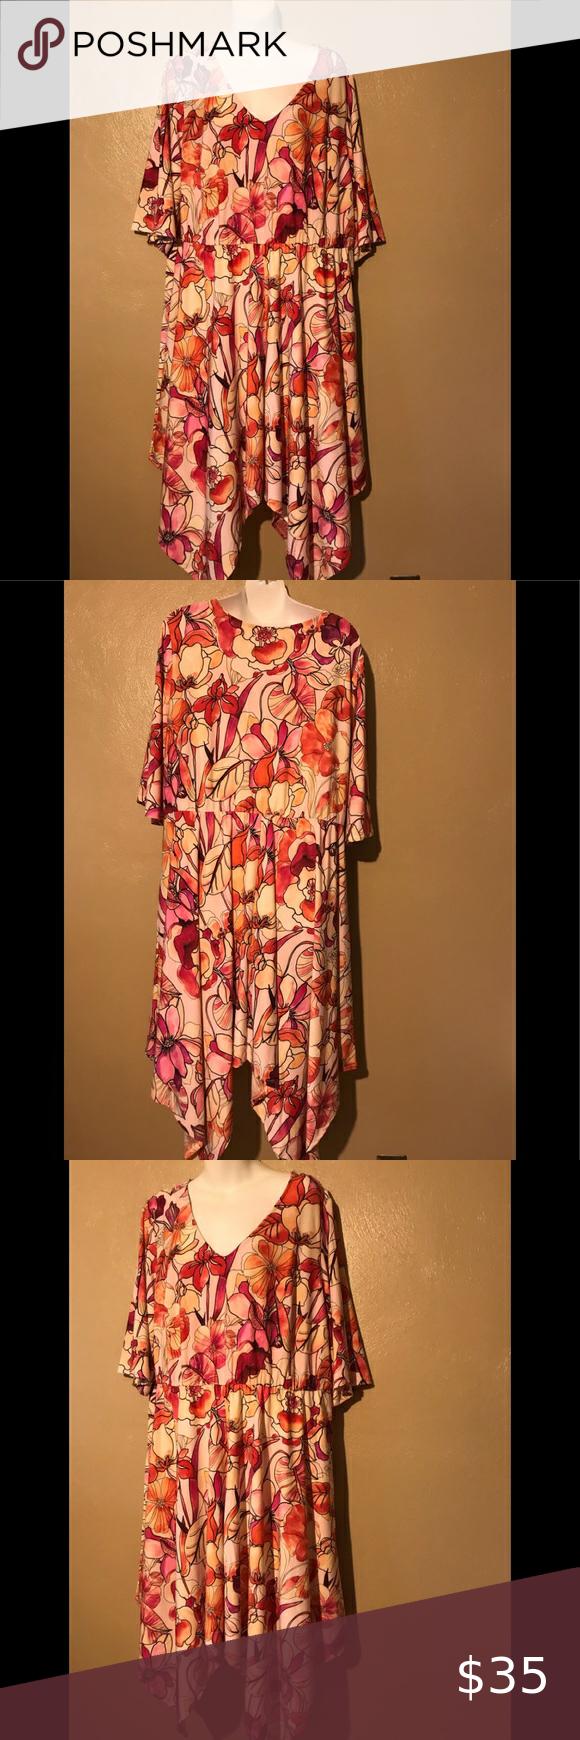 Summer Dress Avenue Asymmetrical Flowered Dress Size 18 20 Elastic Waistband Armpits 25 And Length 48 Avenue Dresses Summer Dresses Dresses Size 18 Dress [ 1740 x 580 Pixel ]